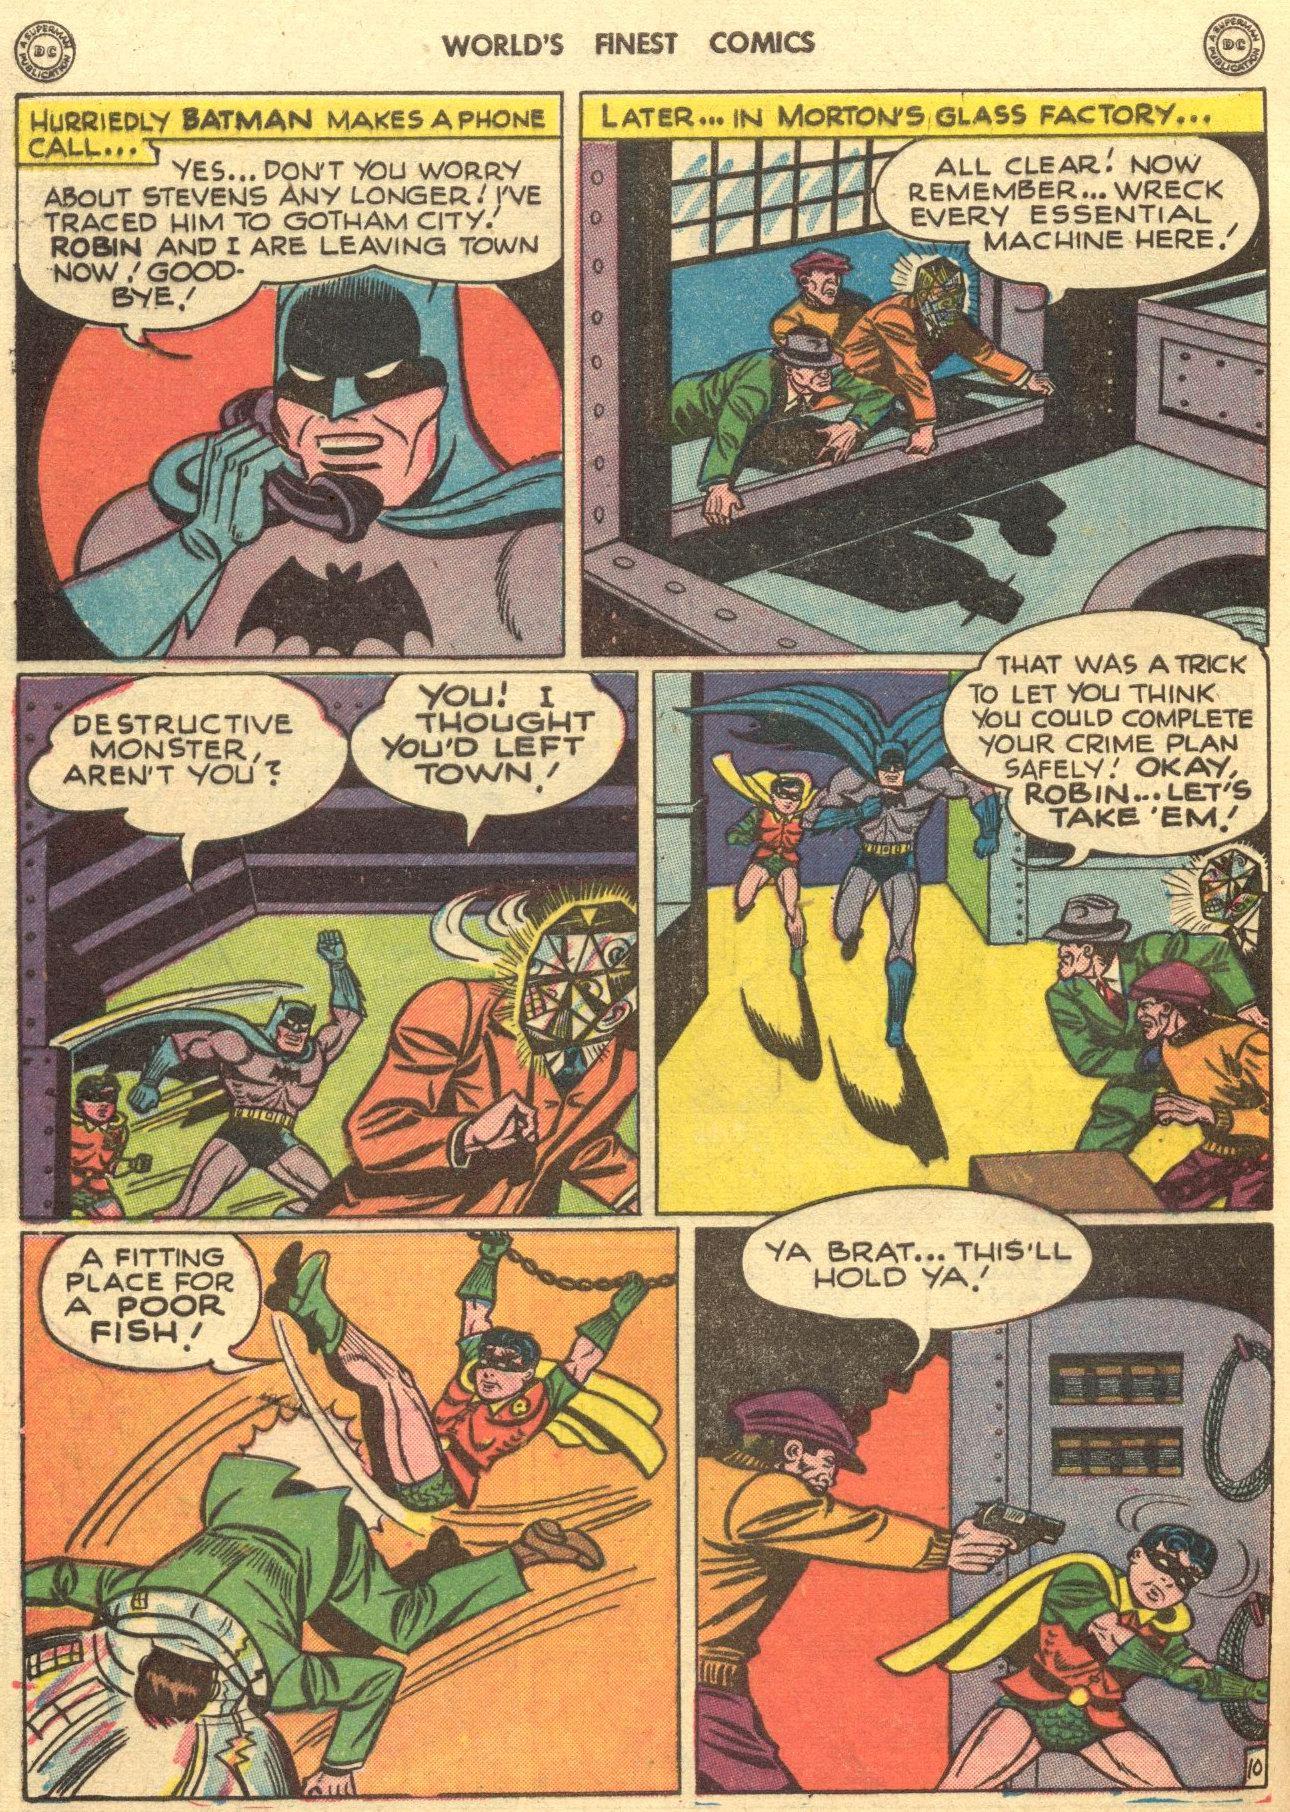 Read online World's Finest Comics comic -  Issue #28 - 69